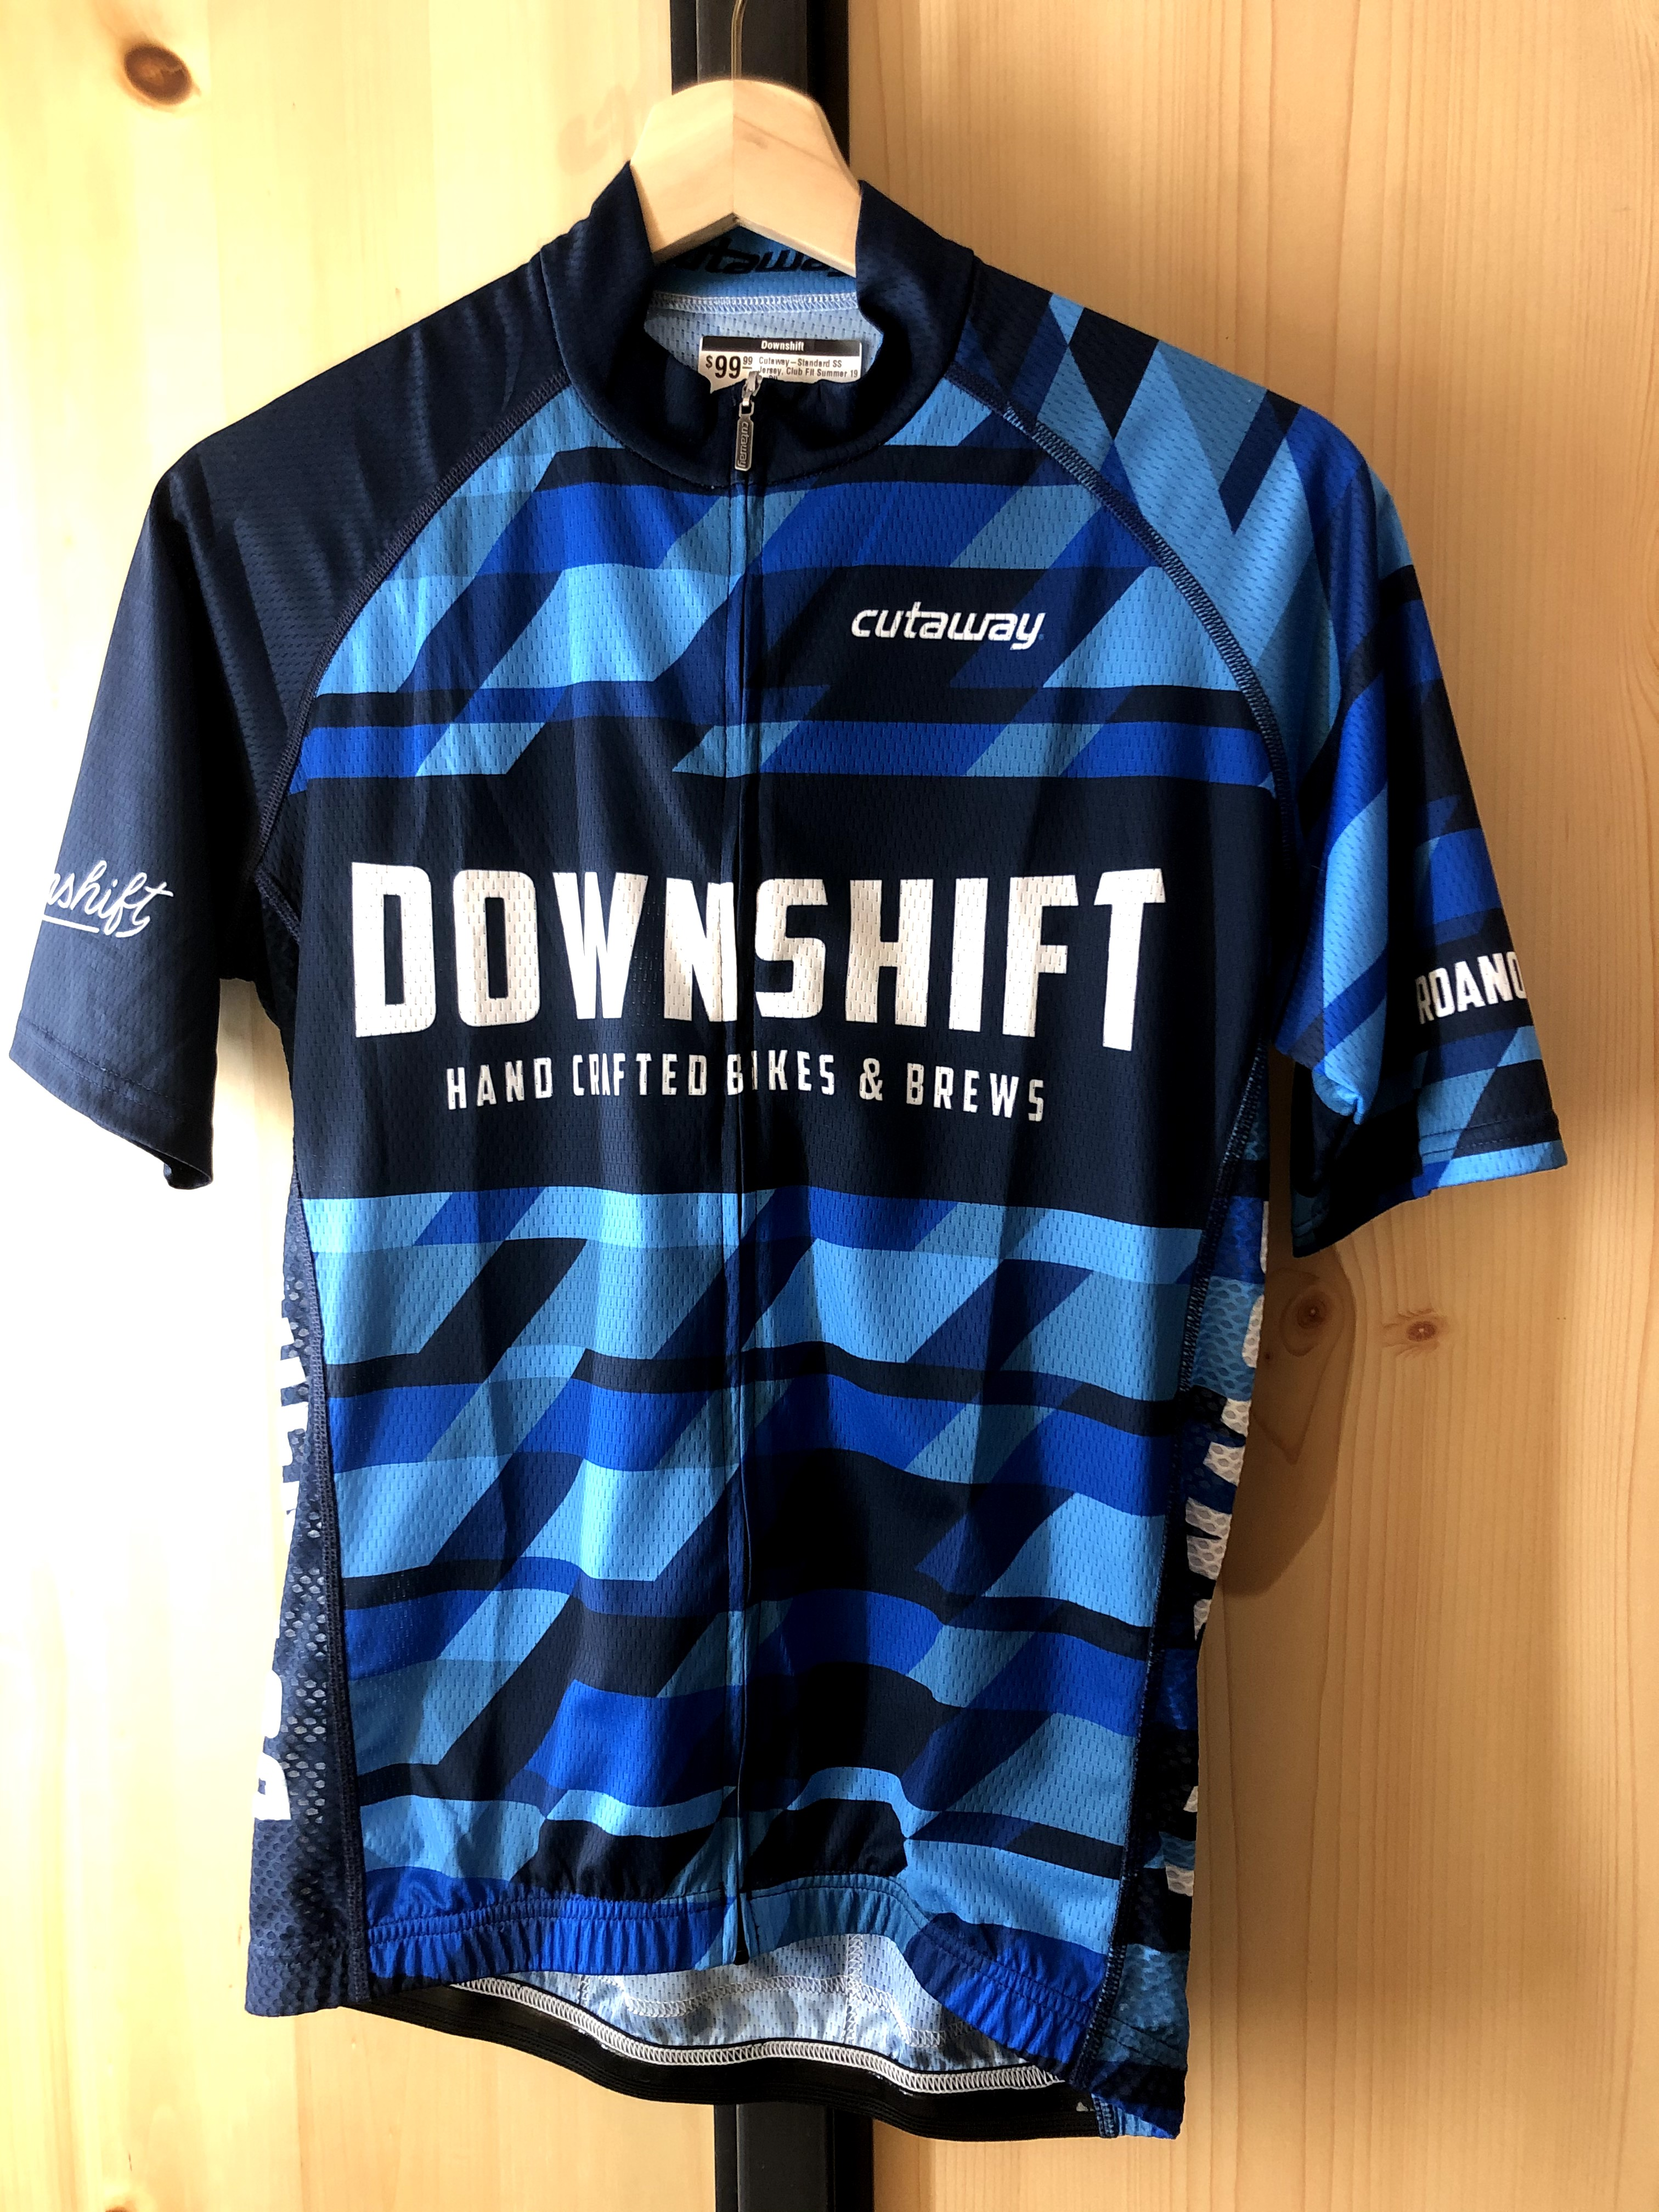 Downshift Cutaway Short Sleeve Jersey